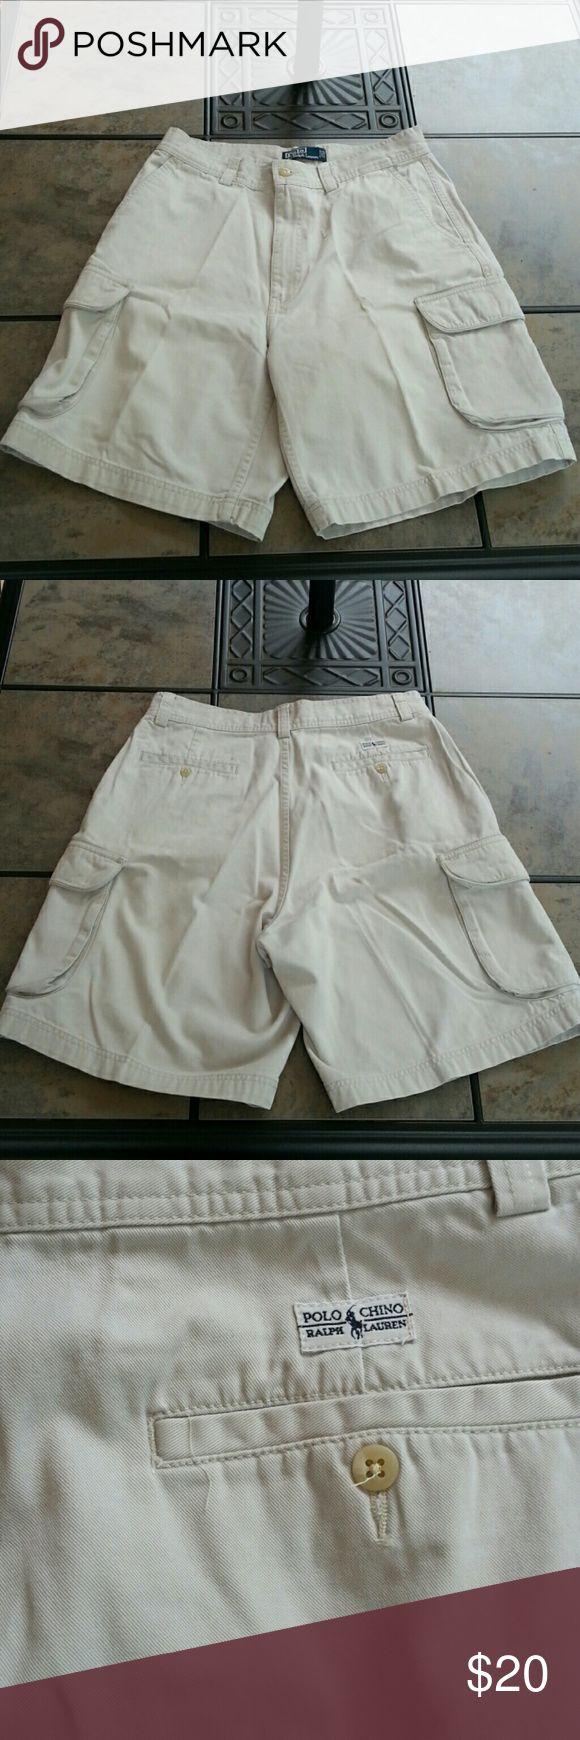 "Ralph Lauren Polo Cargo Chino Short  33W 100% Cotton,  8"" inseam, cargo pockets Polo by Ralph Lauren Shorts Cargo"